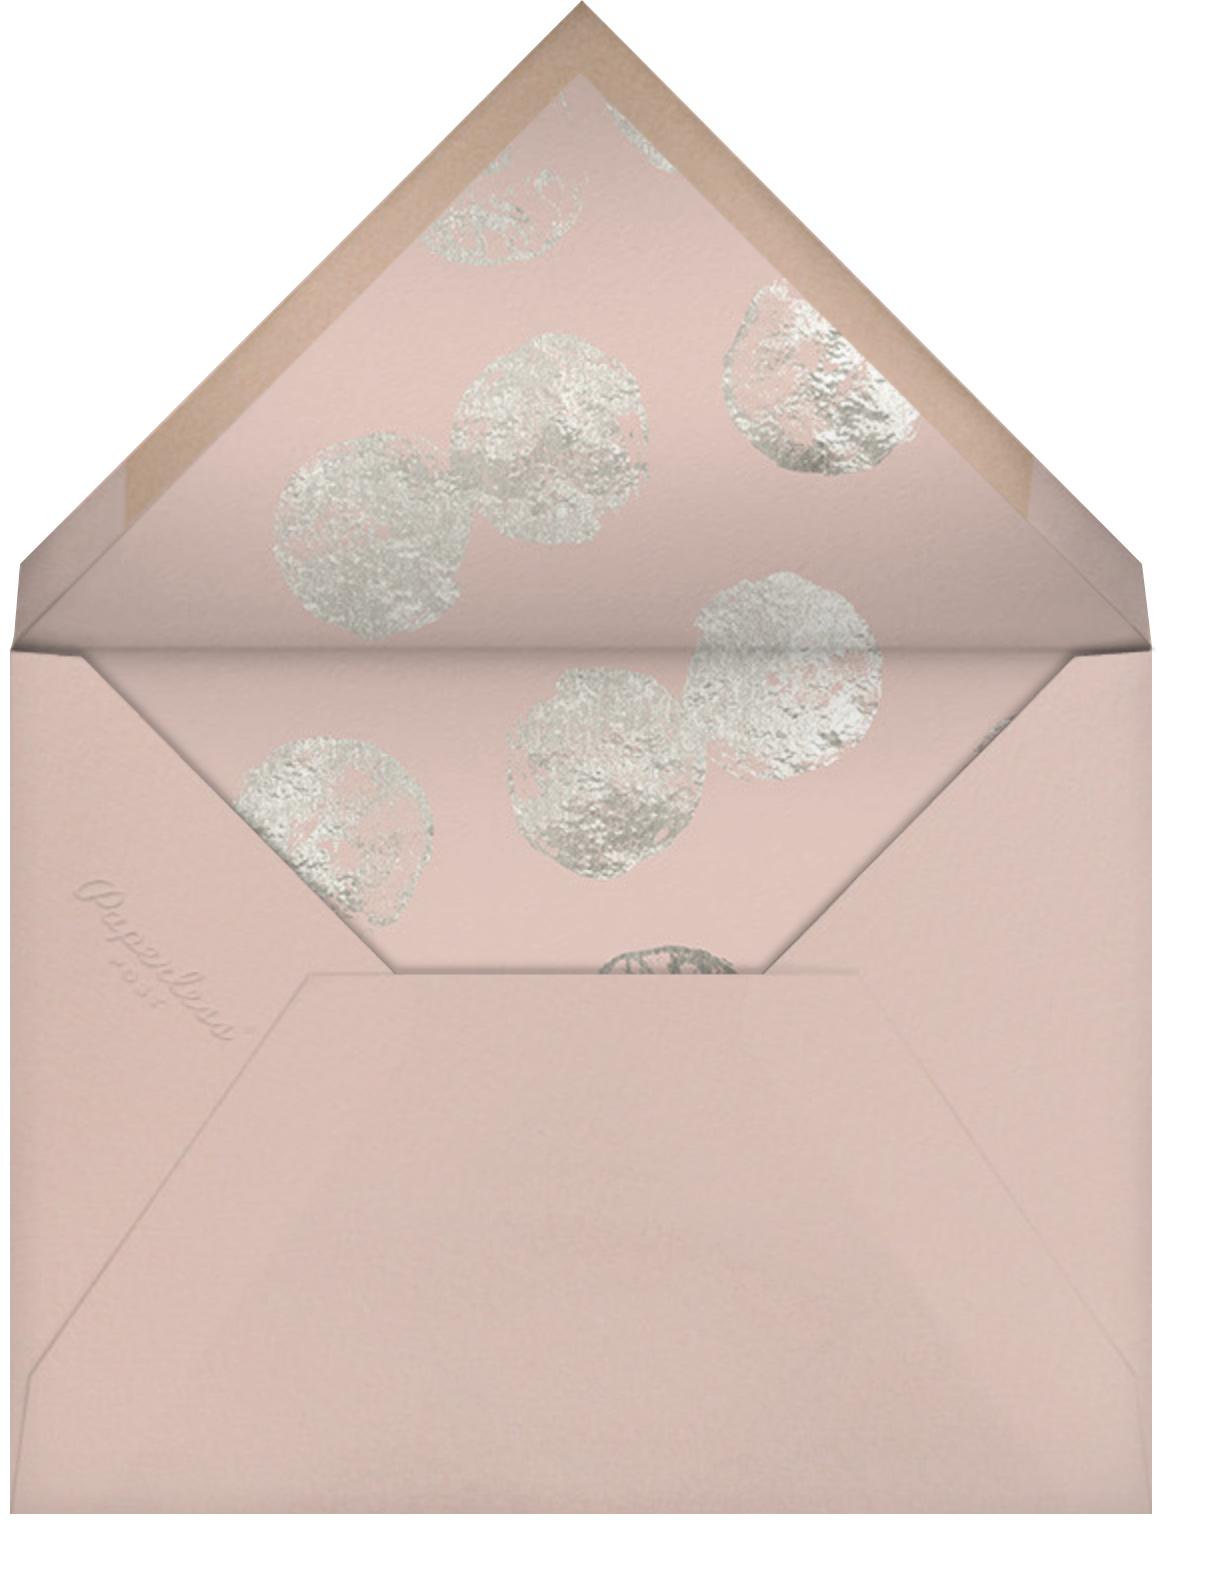 Framework (Photo) - Pink/Silver - Kelly Wearstler - Envelope